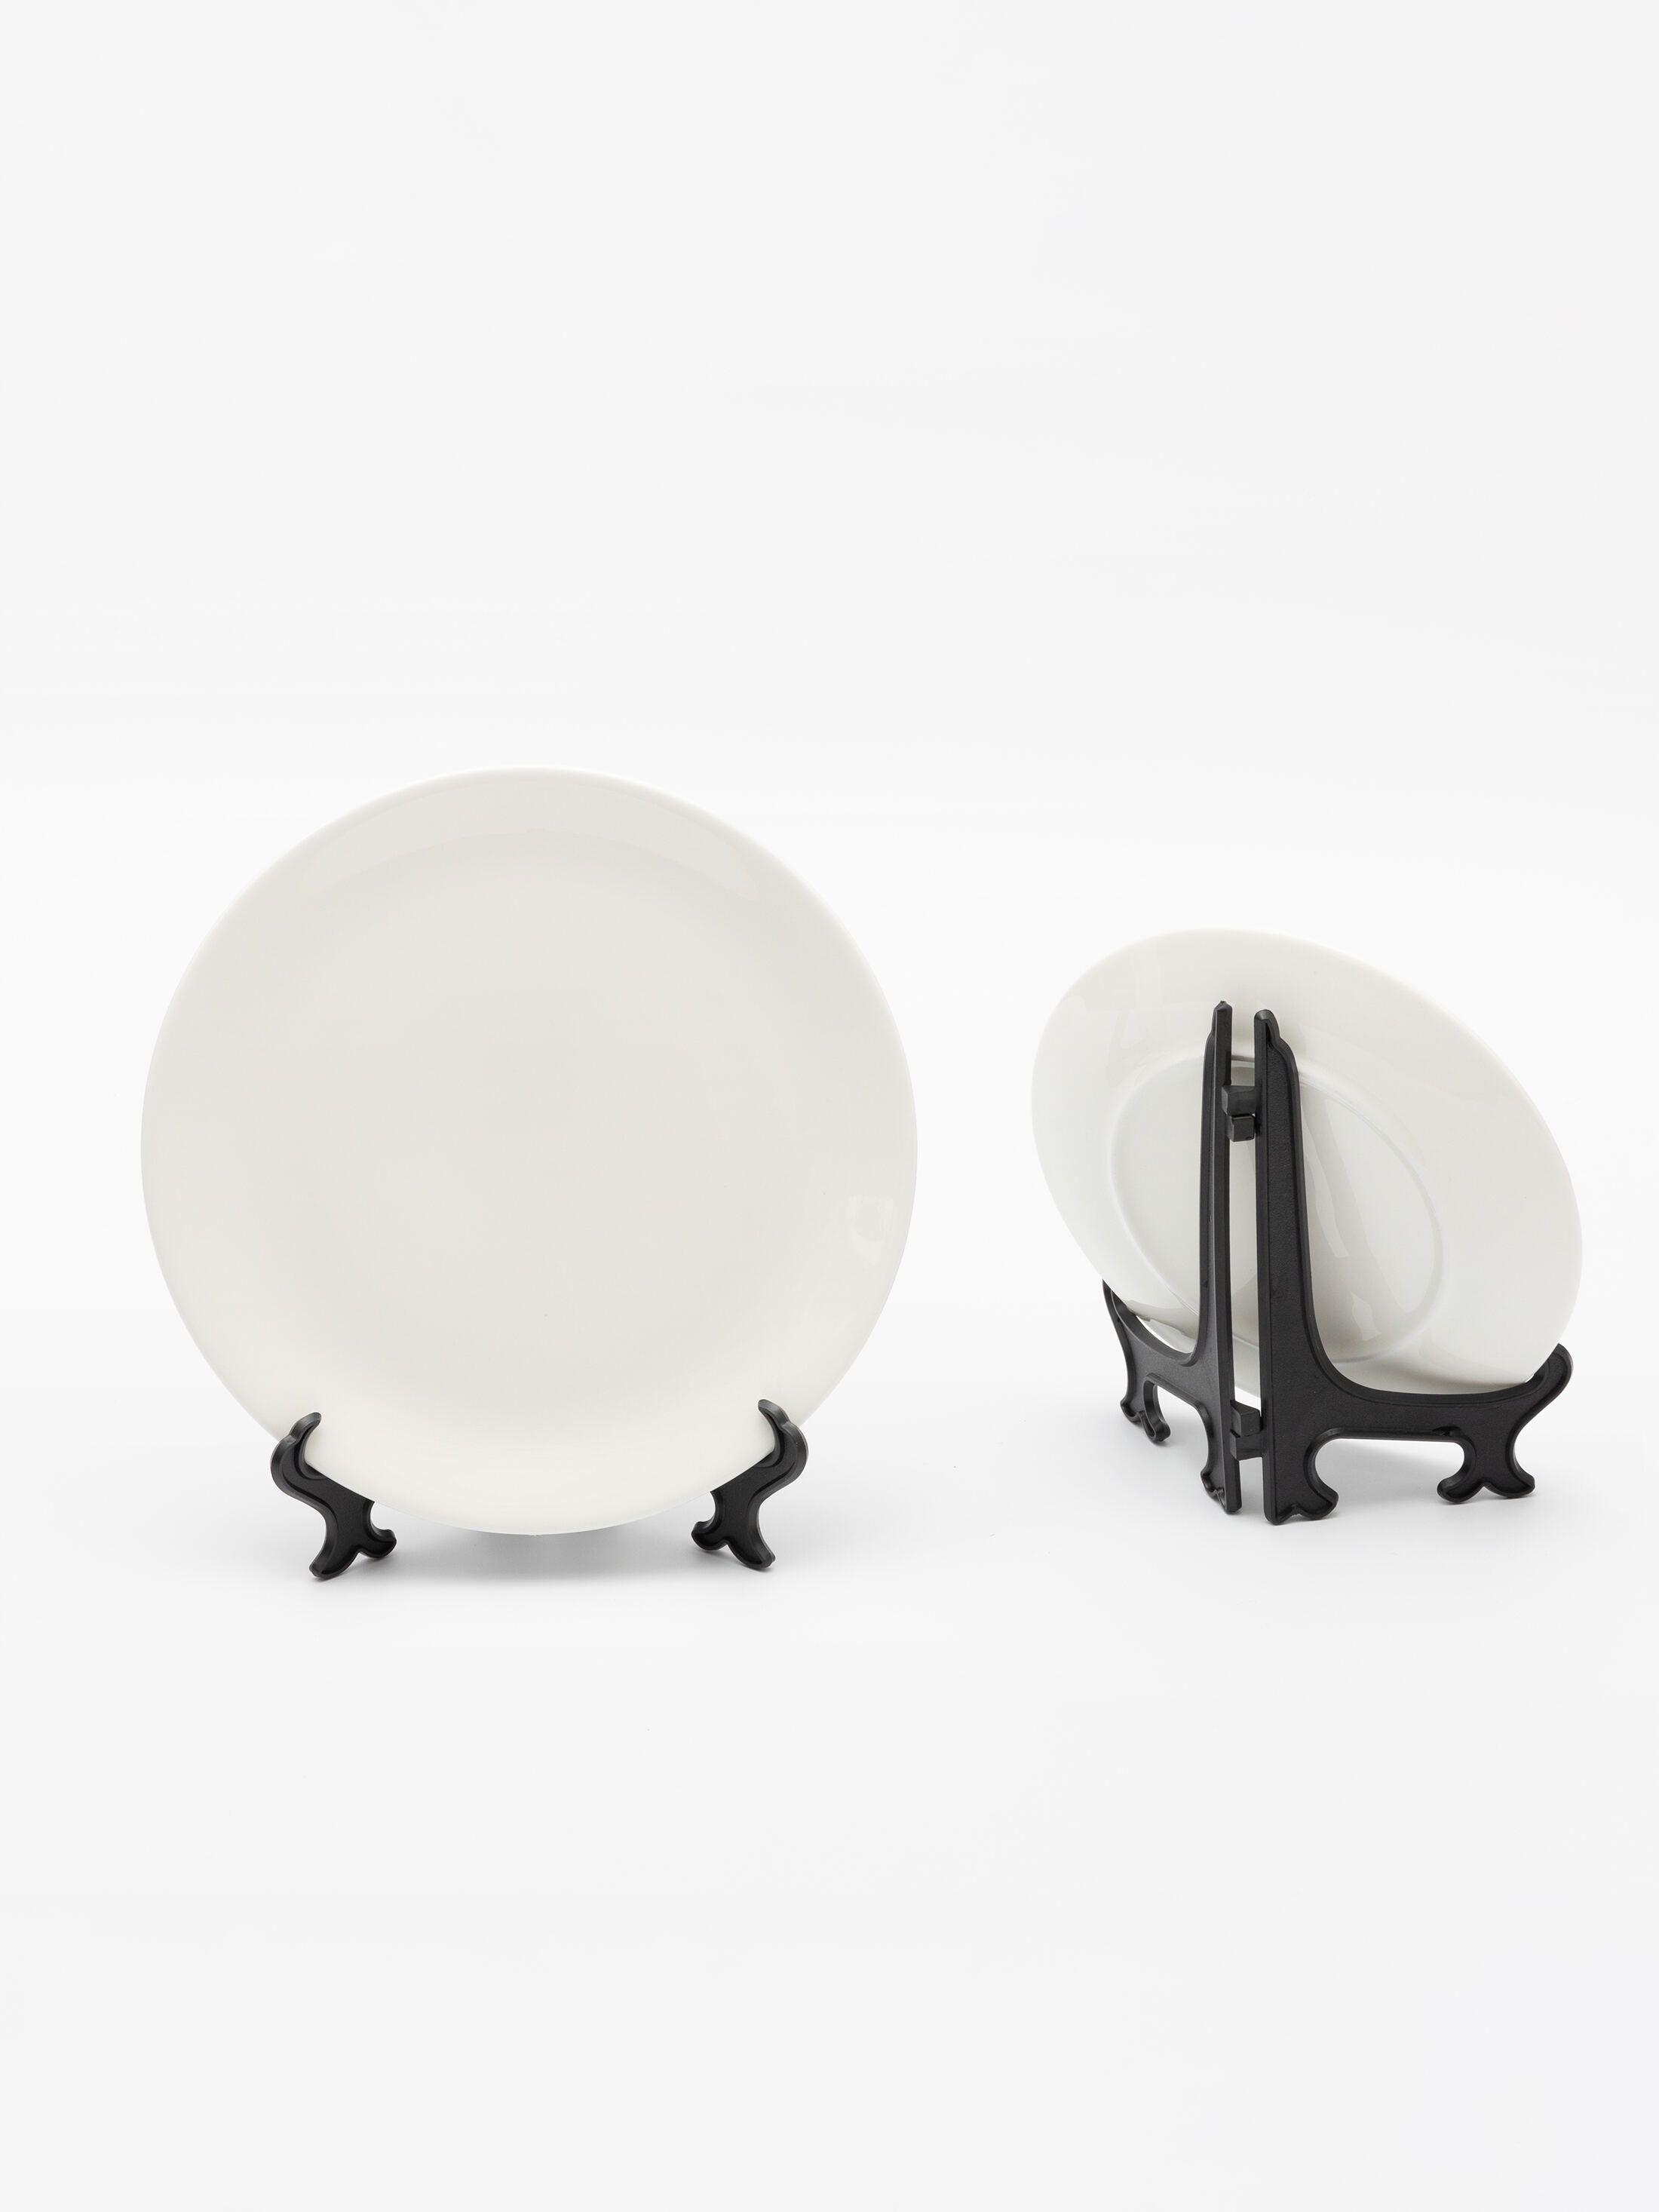 customised plates on stand